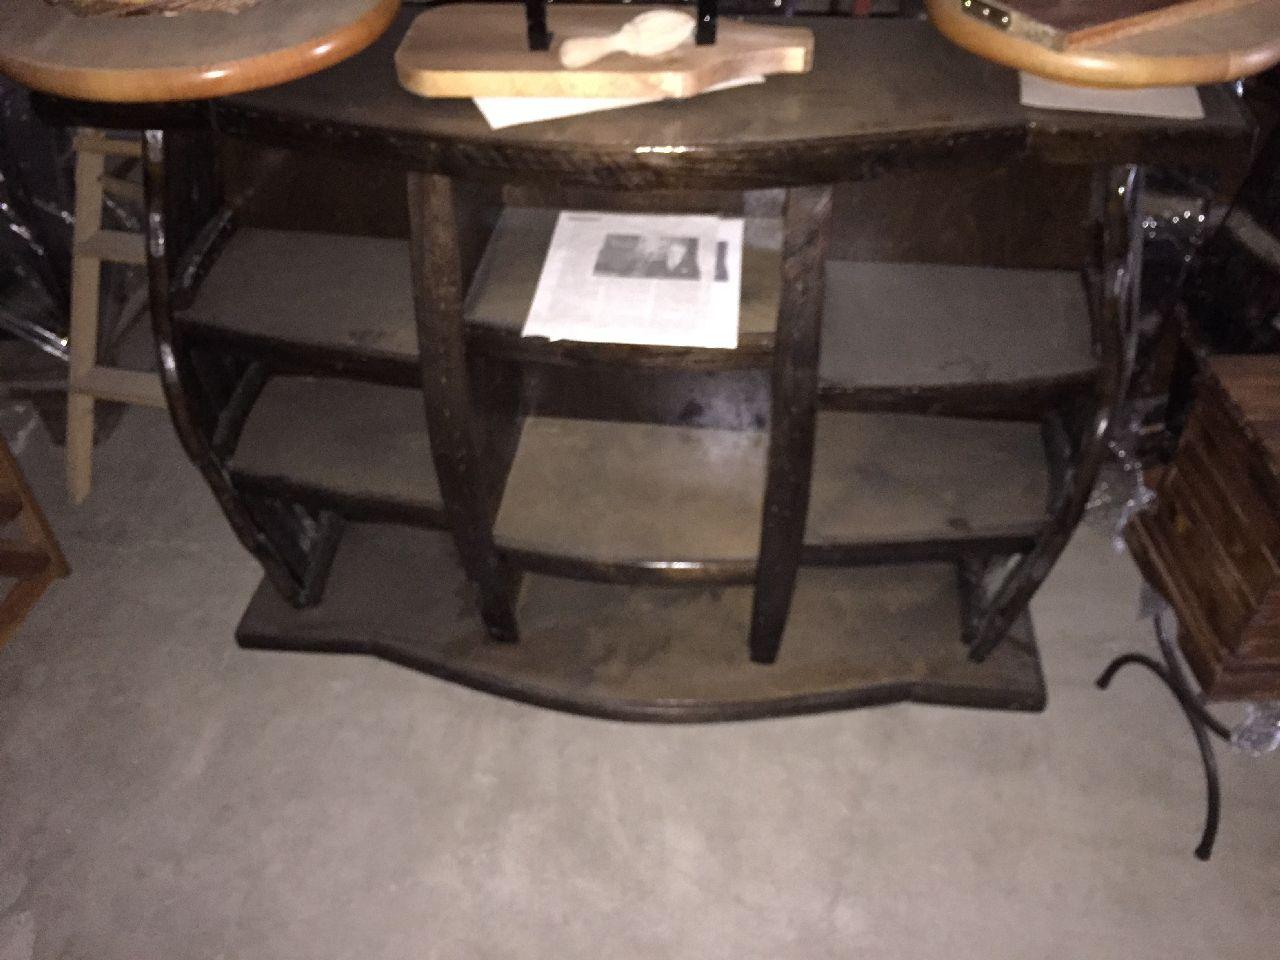 N.2 botti espositive in legno n.1 sgabello in ferro n.1 bauletto